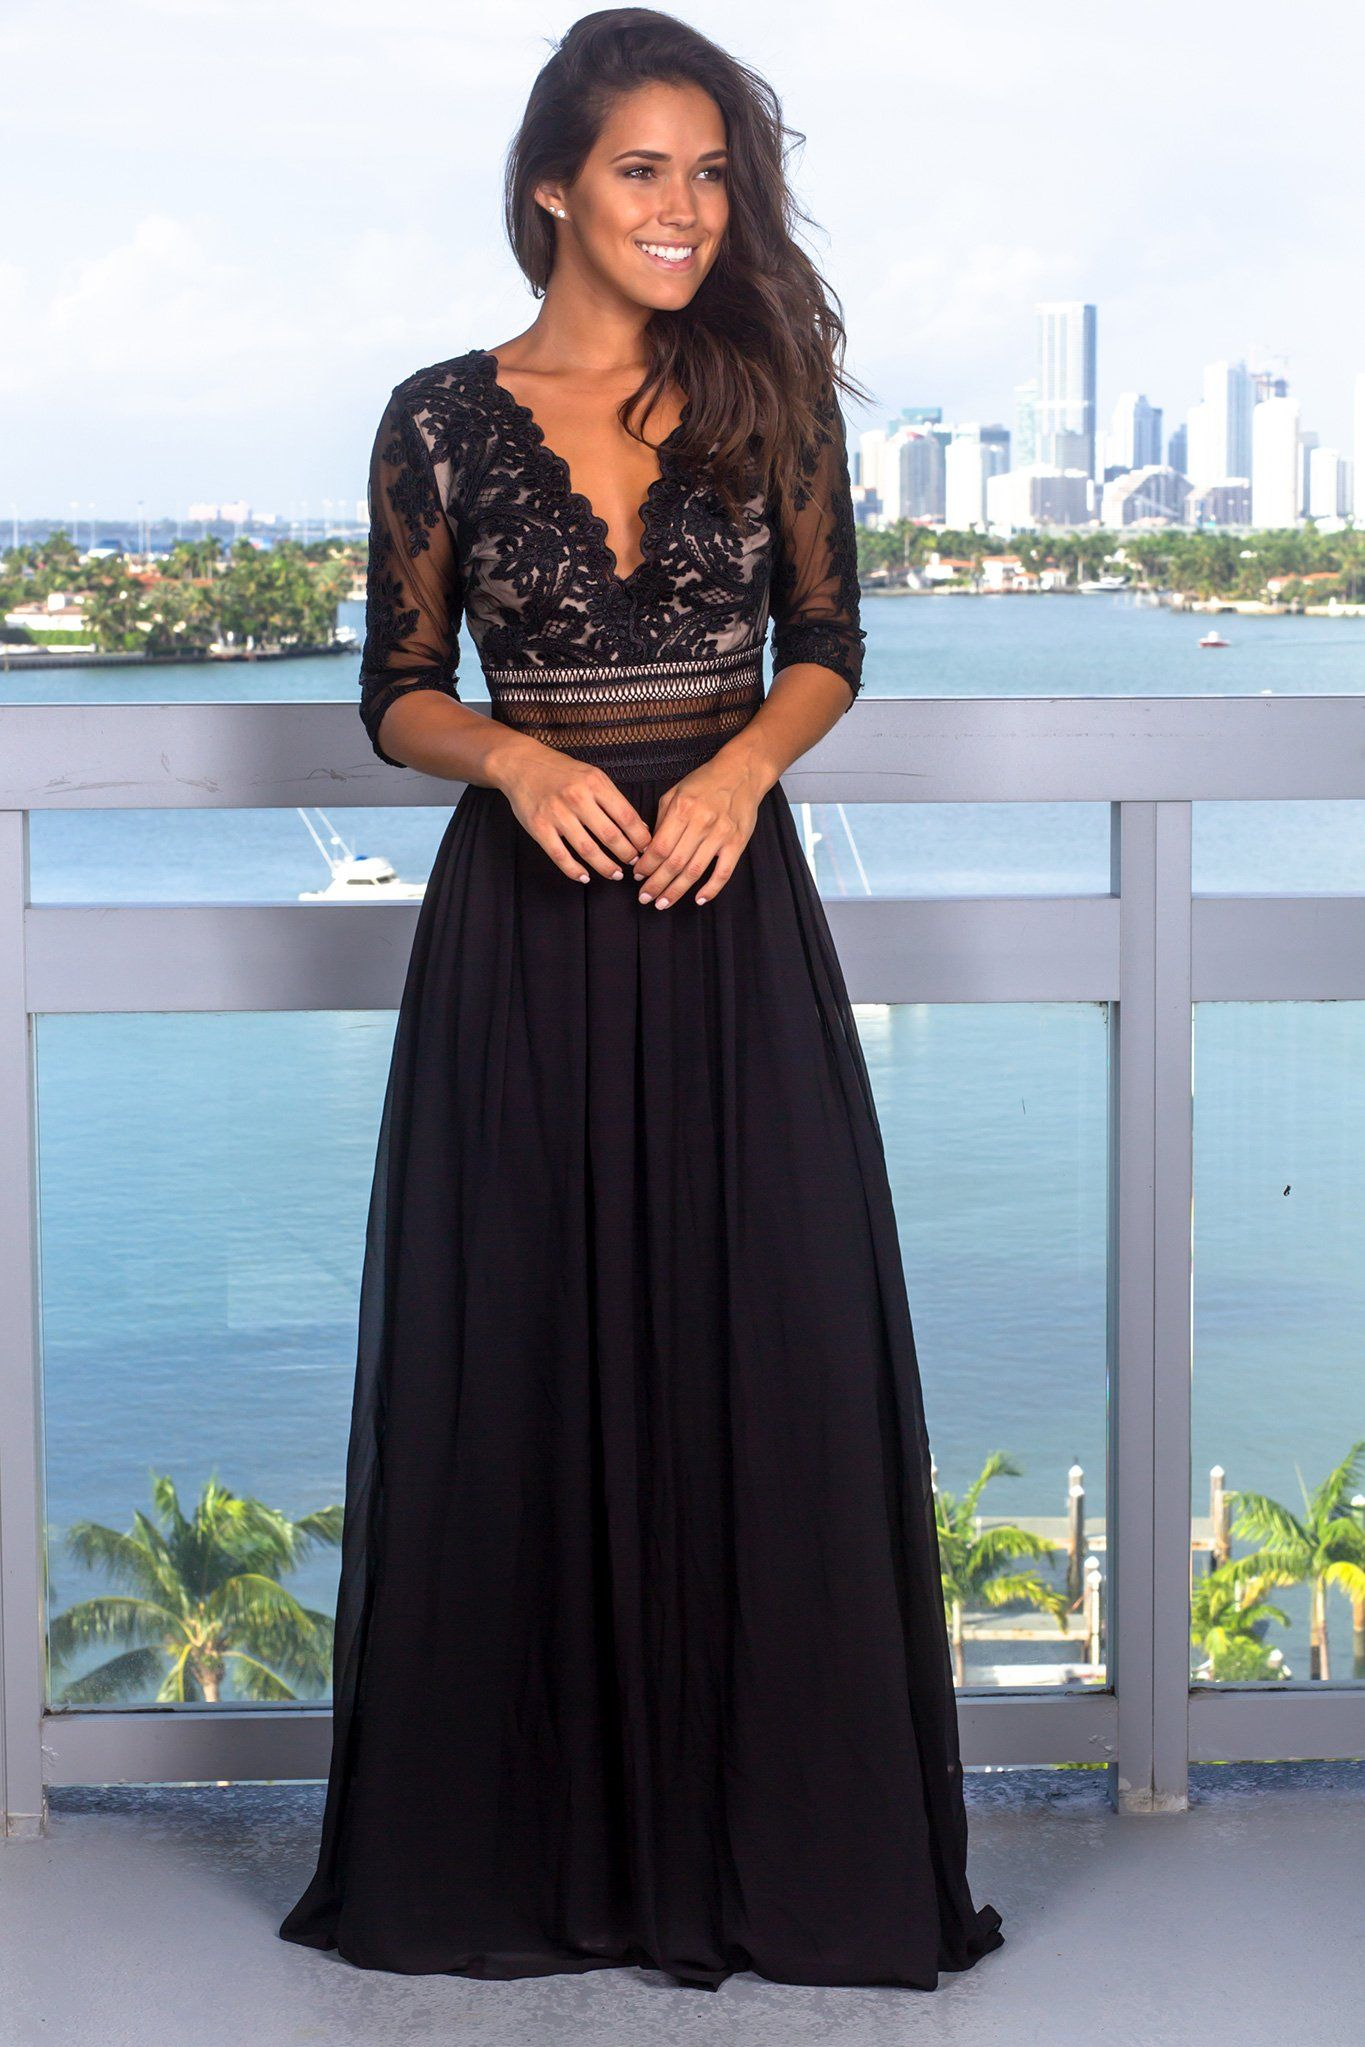 Wishlist Saved By The Dress Black Tie Event Dresses Maxi Dress Black Tie Wedding Guest Dress